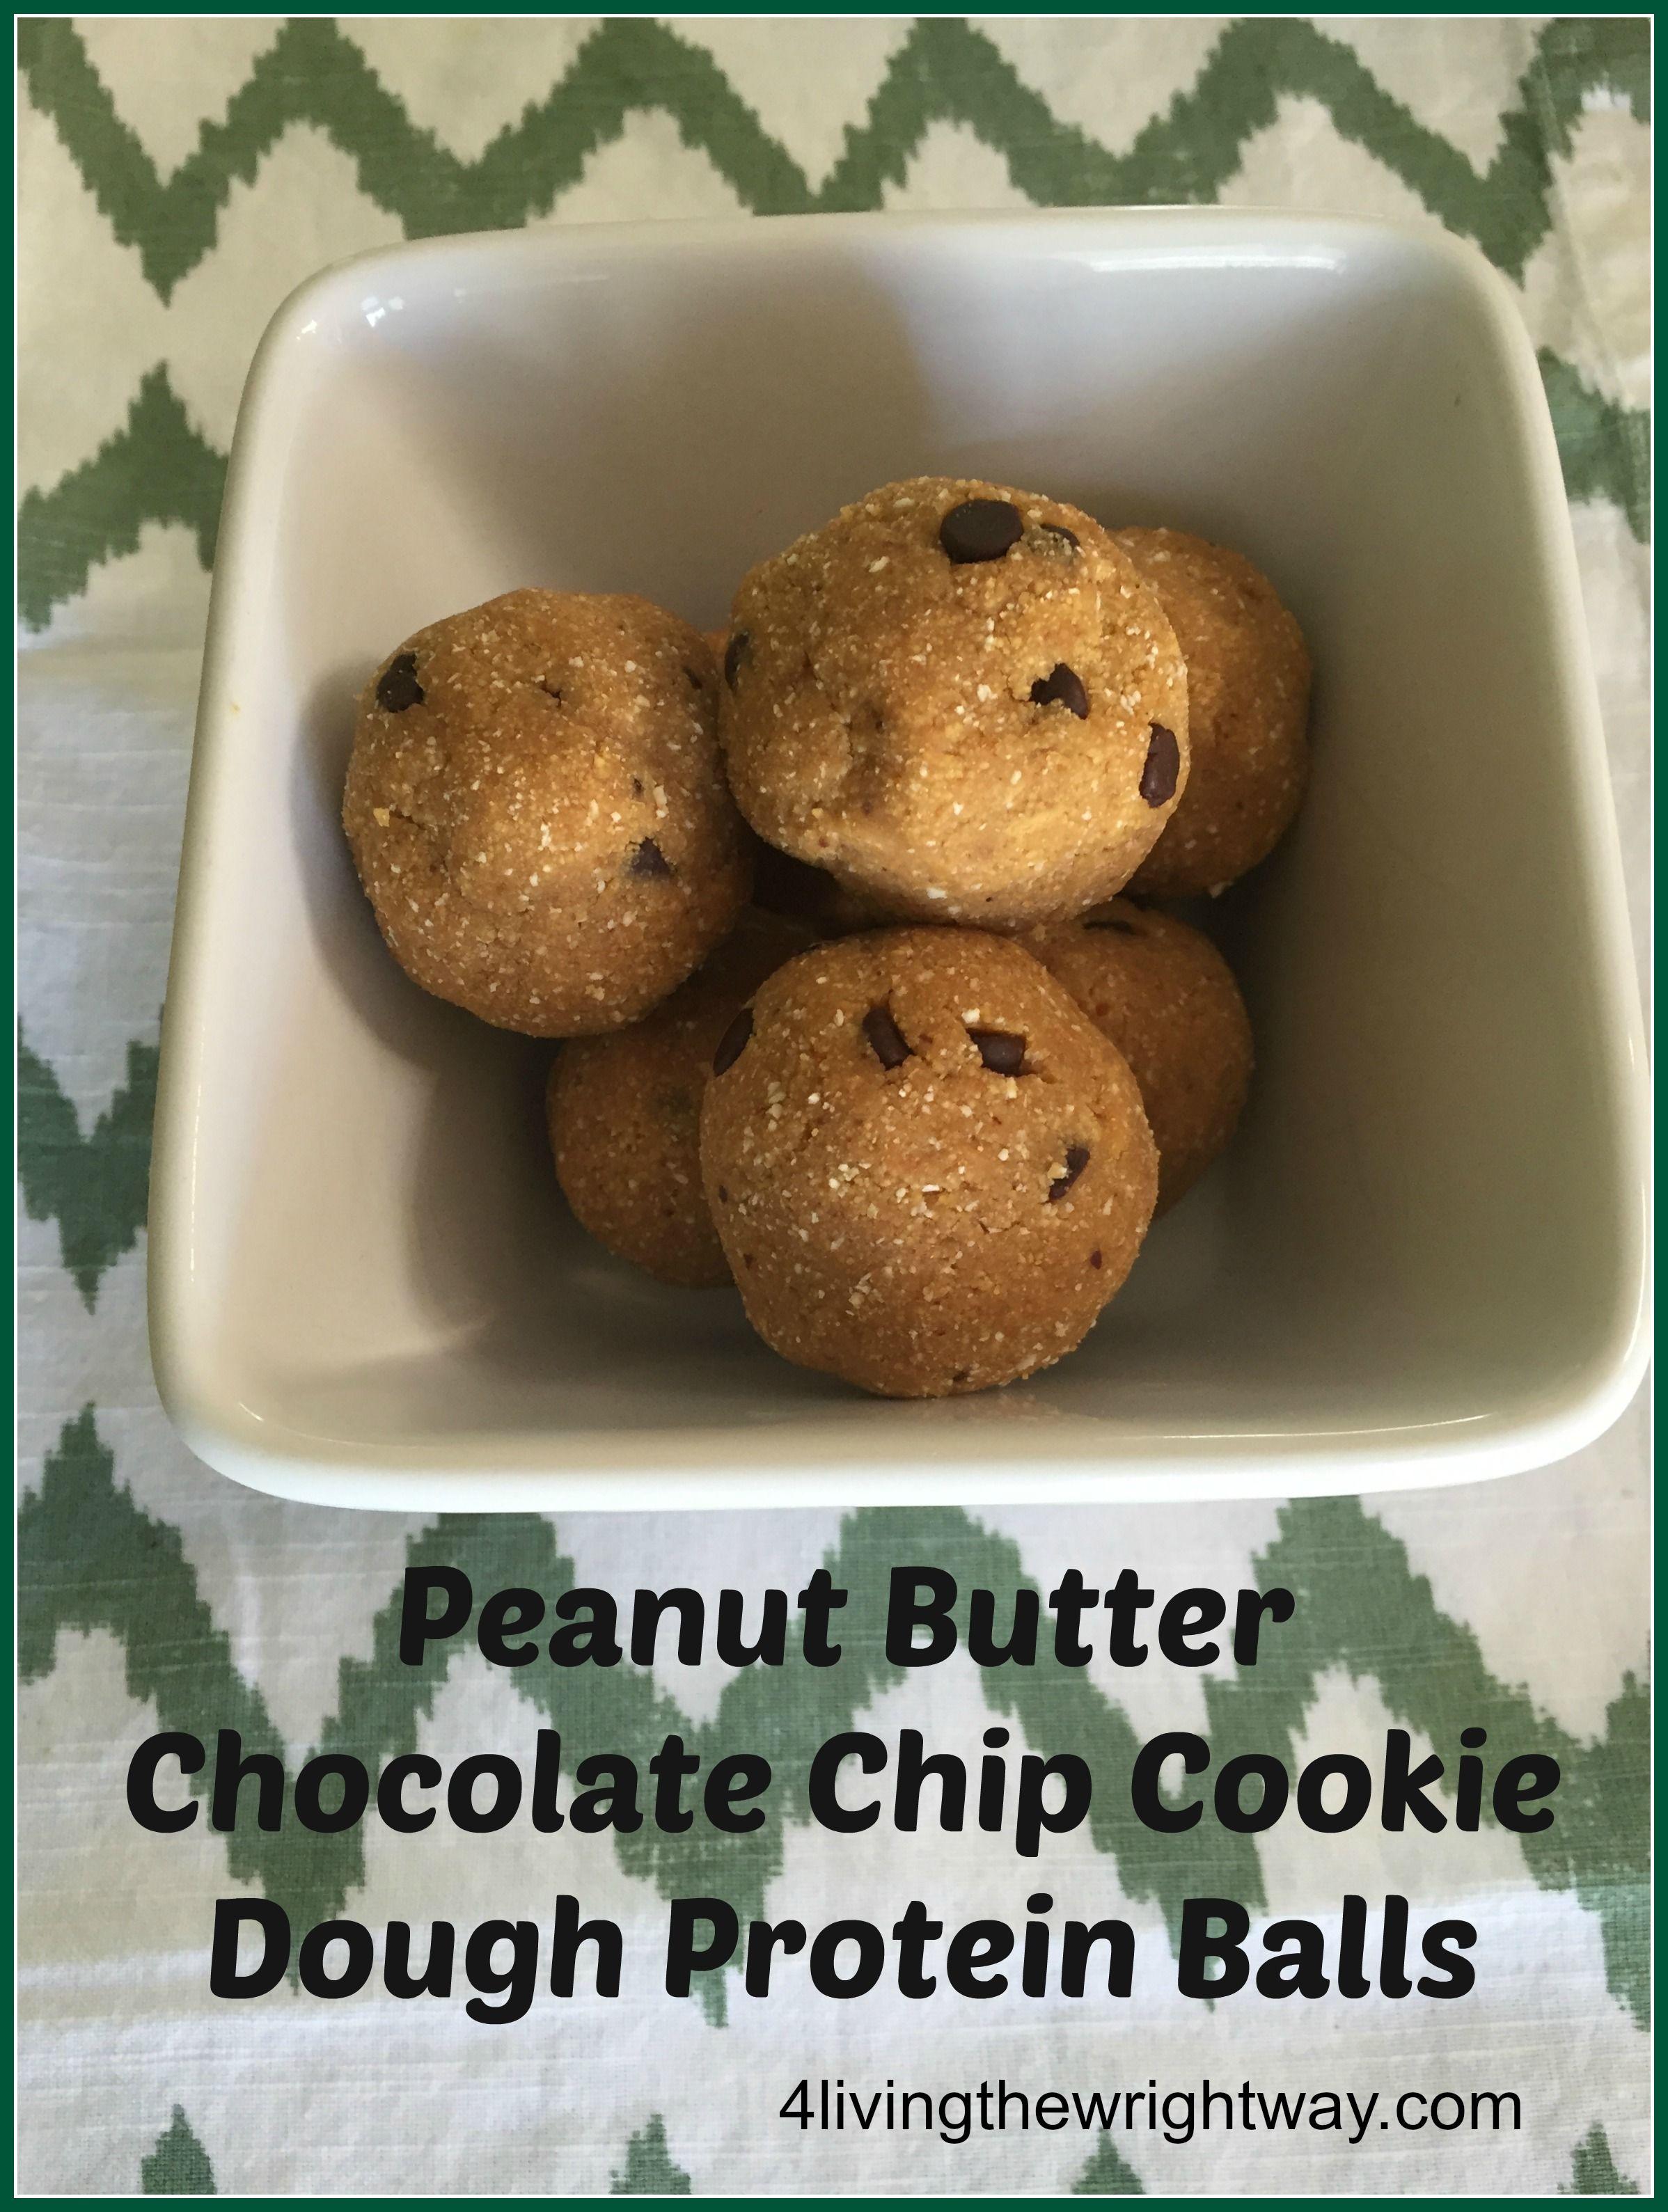 Vegan, Gluten and Dairy Free Protein Ball Recipe